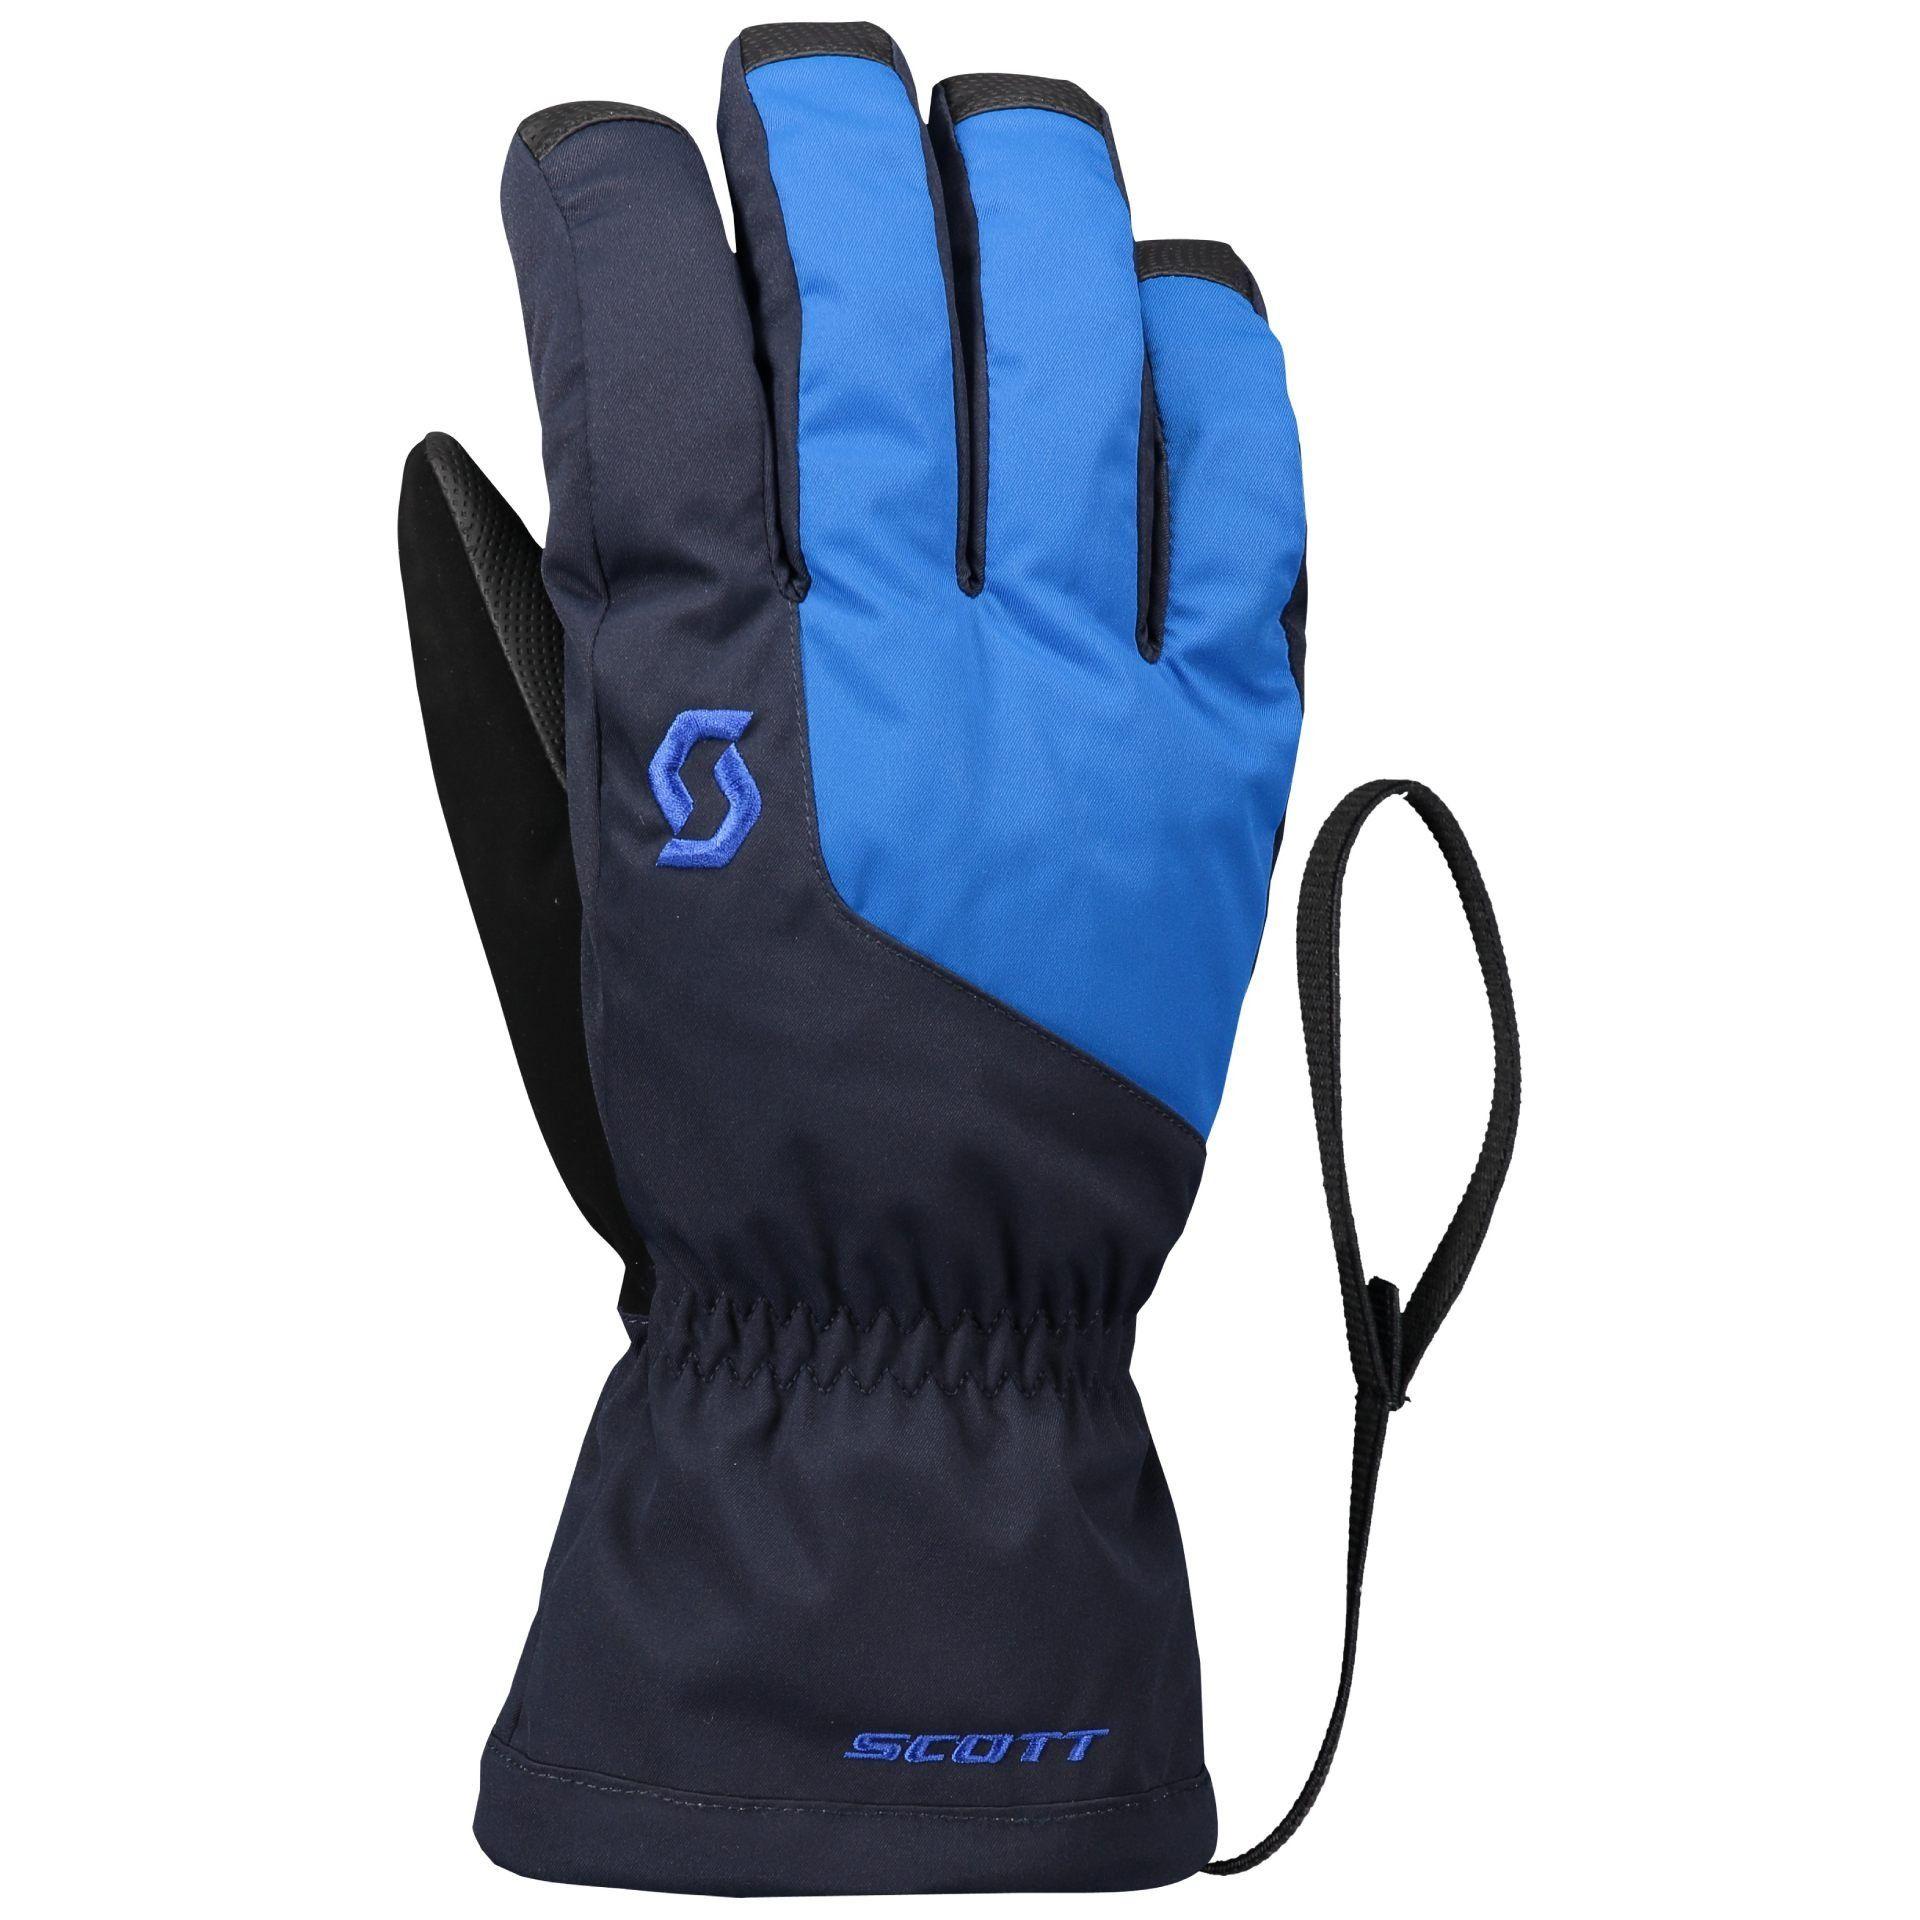 RĘKAWICE SCOTT ULTIMATE GTX GLOVE 277941 DARK BLUE SKYDIVE BLUE